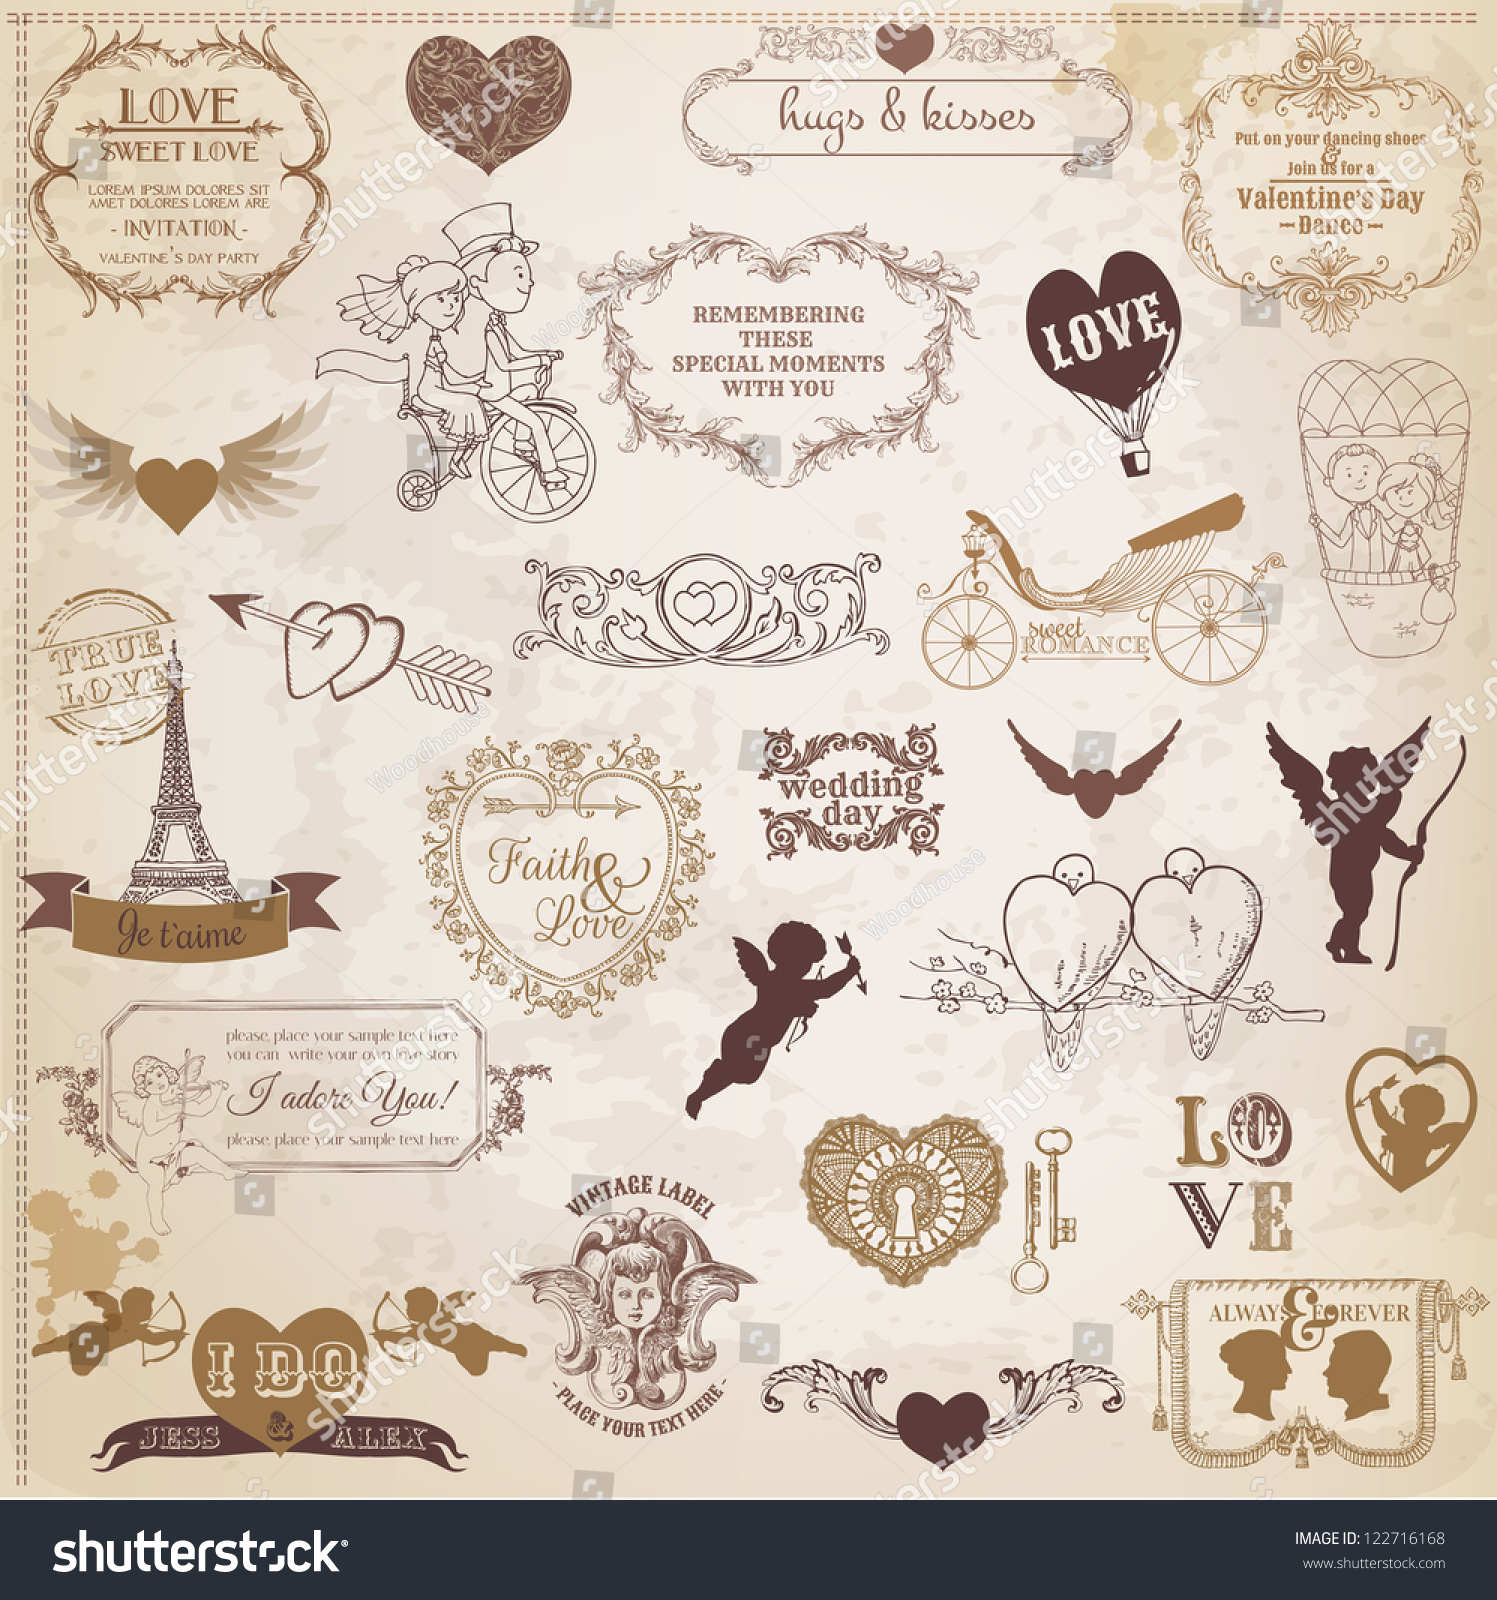 How to scrapbook wedding invitations - Scrapbook Design Elements Valentine S Day Love Set For Wedding Invitation Scrap